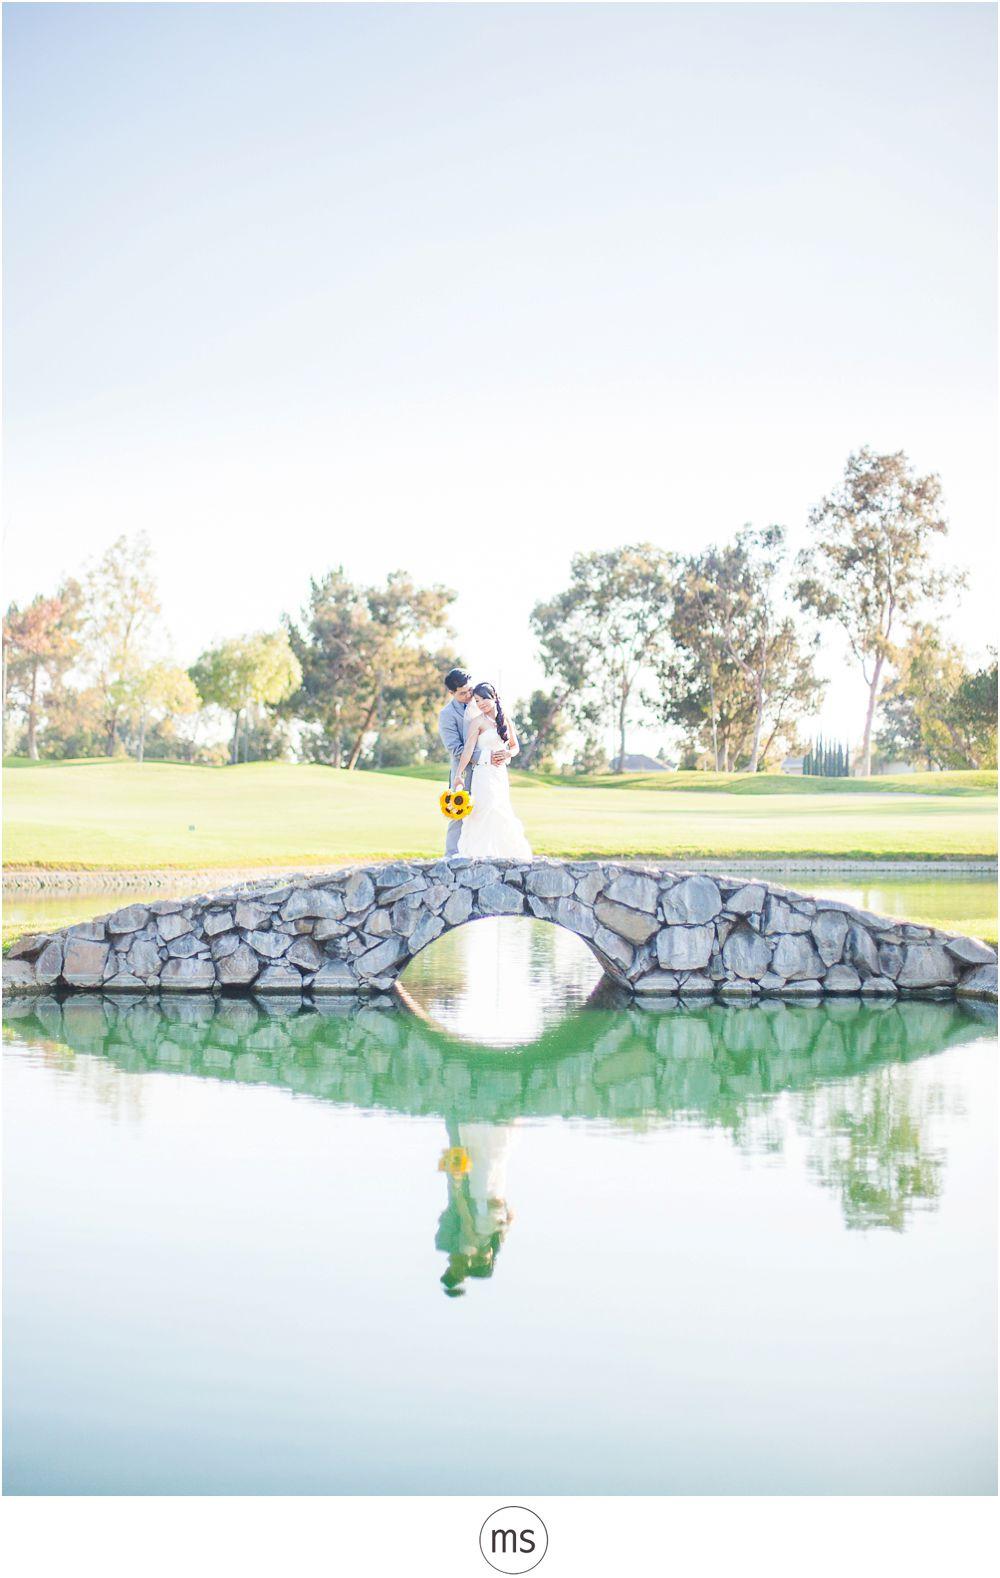 Charles & Sarah Alta Vista Country Club Placentia Wedding - Margarette Sia Photography_0080